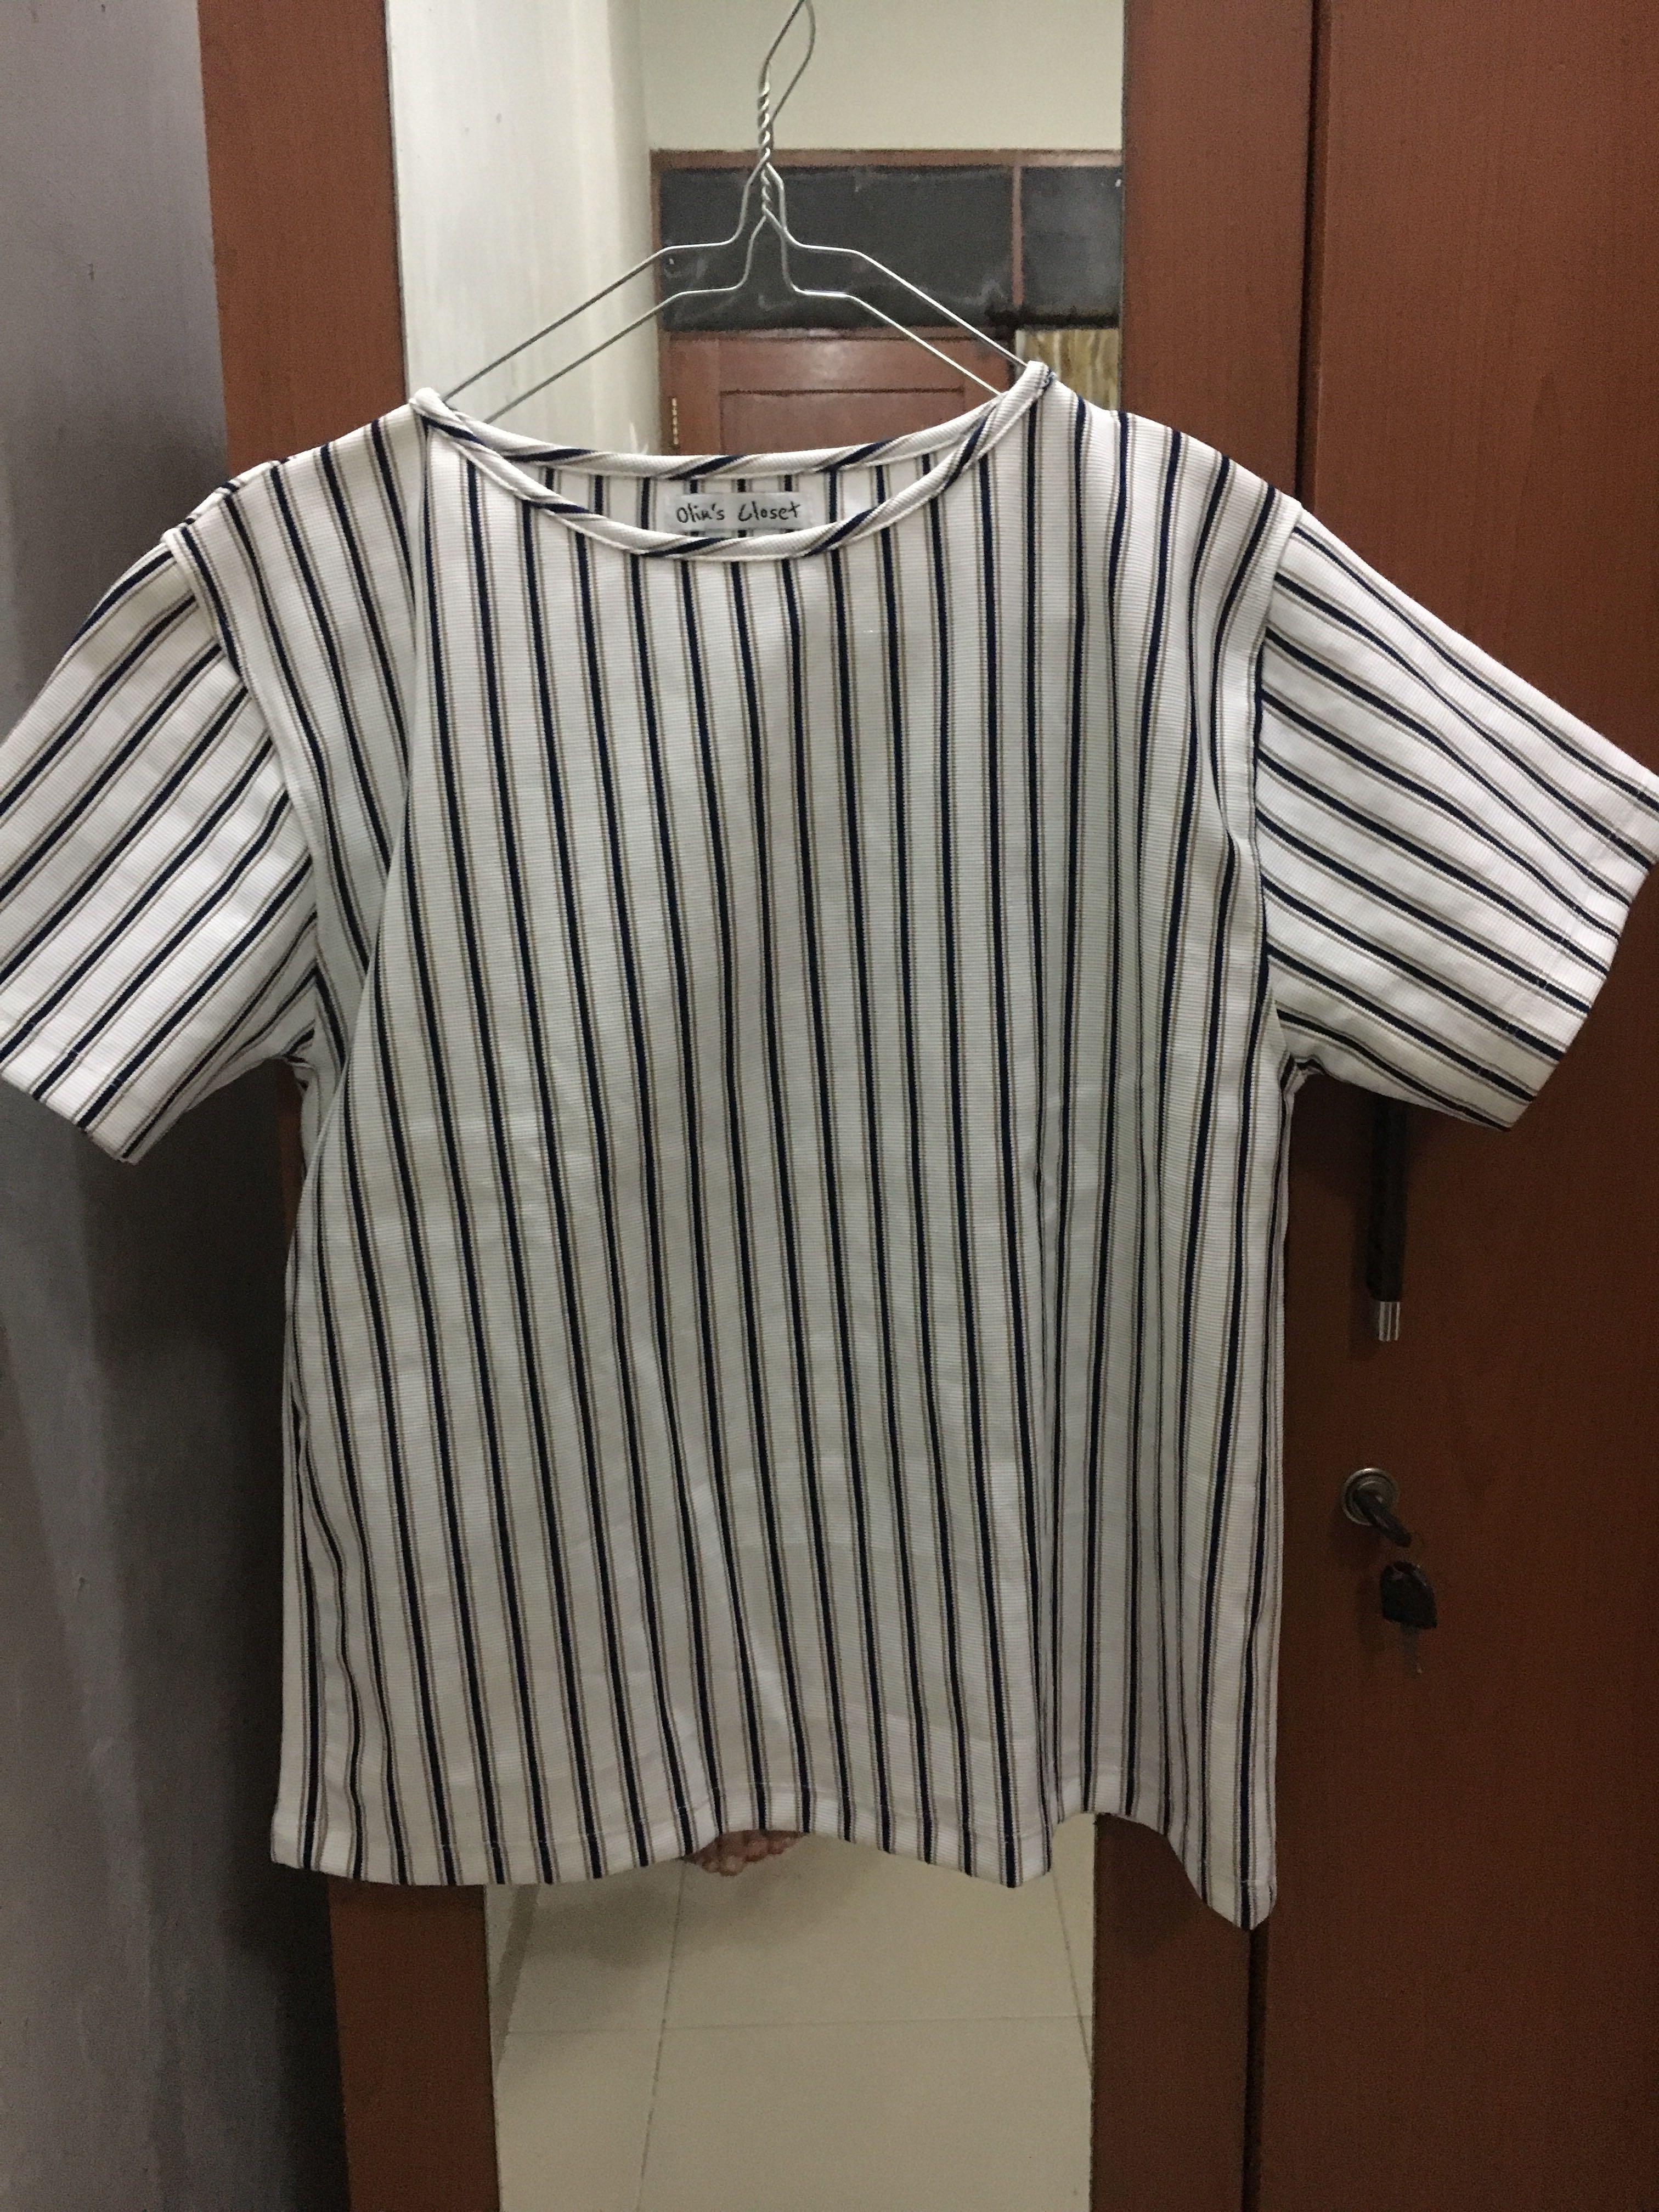 Olin's Closet Striped Top